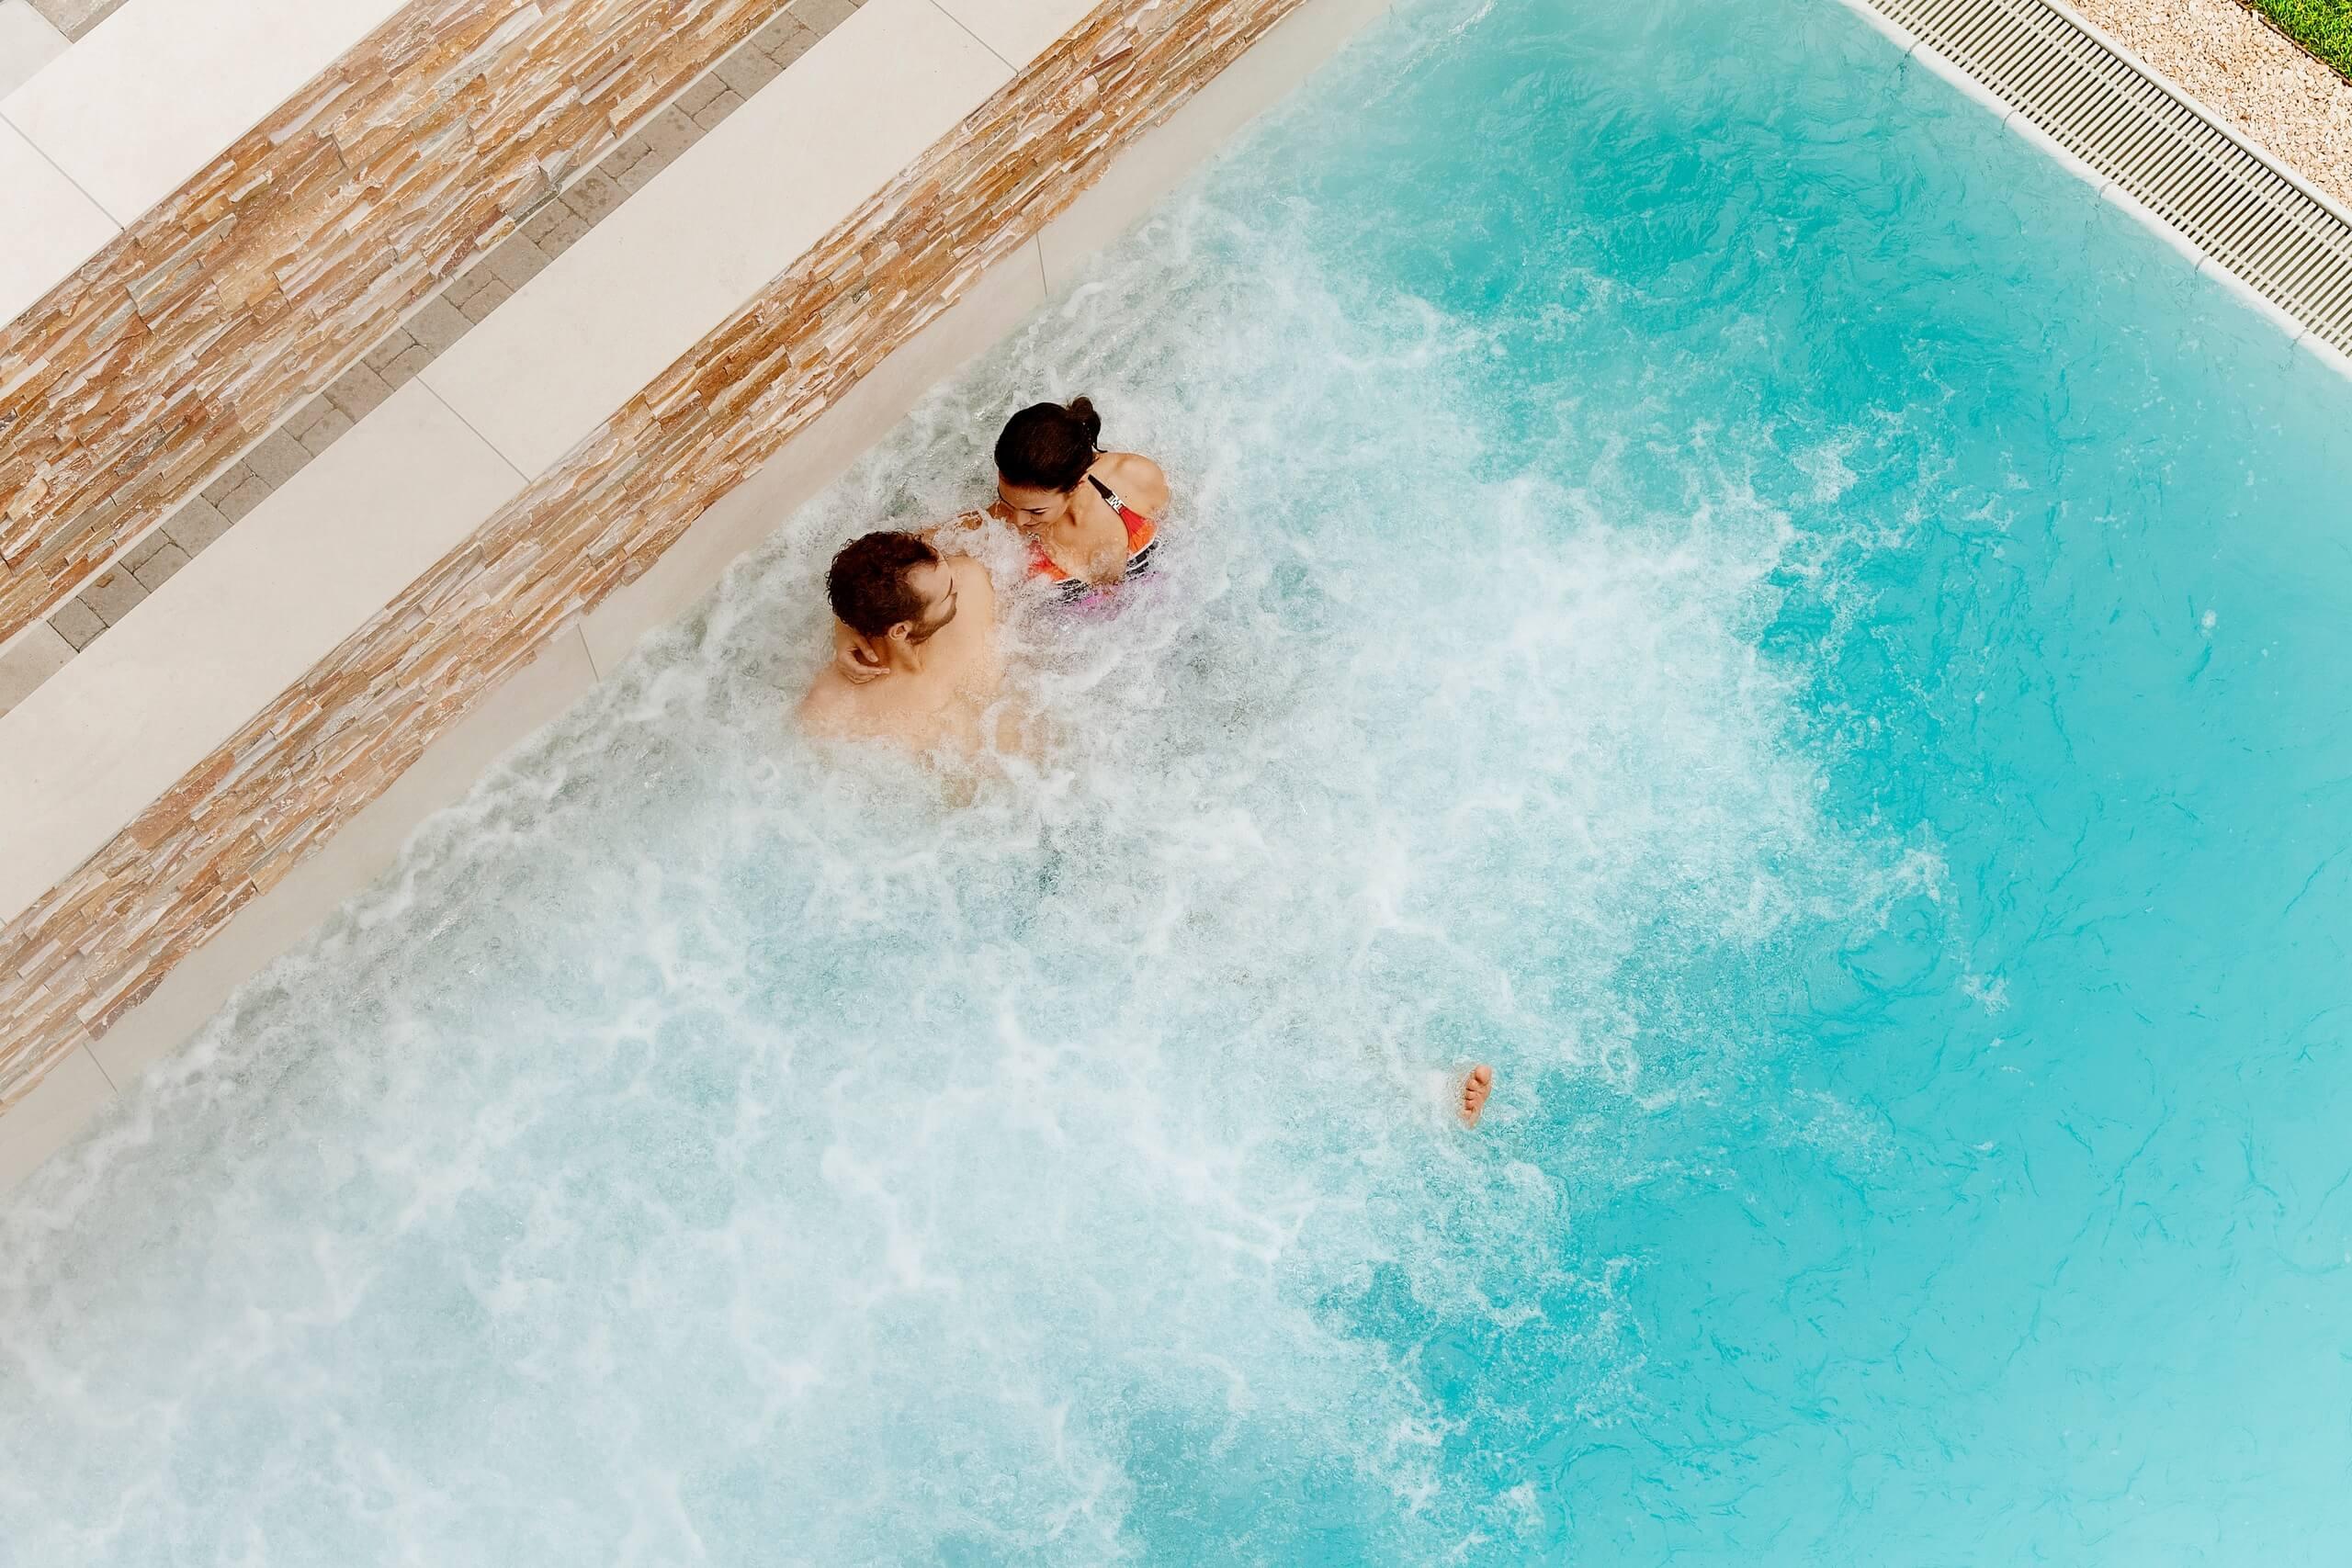 eden-spa-hallenbad-sprudelbad-wellness